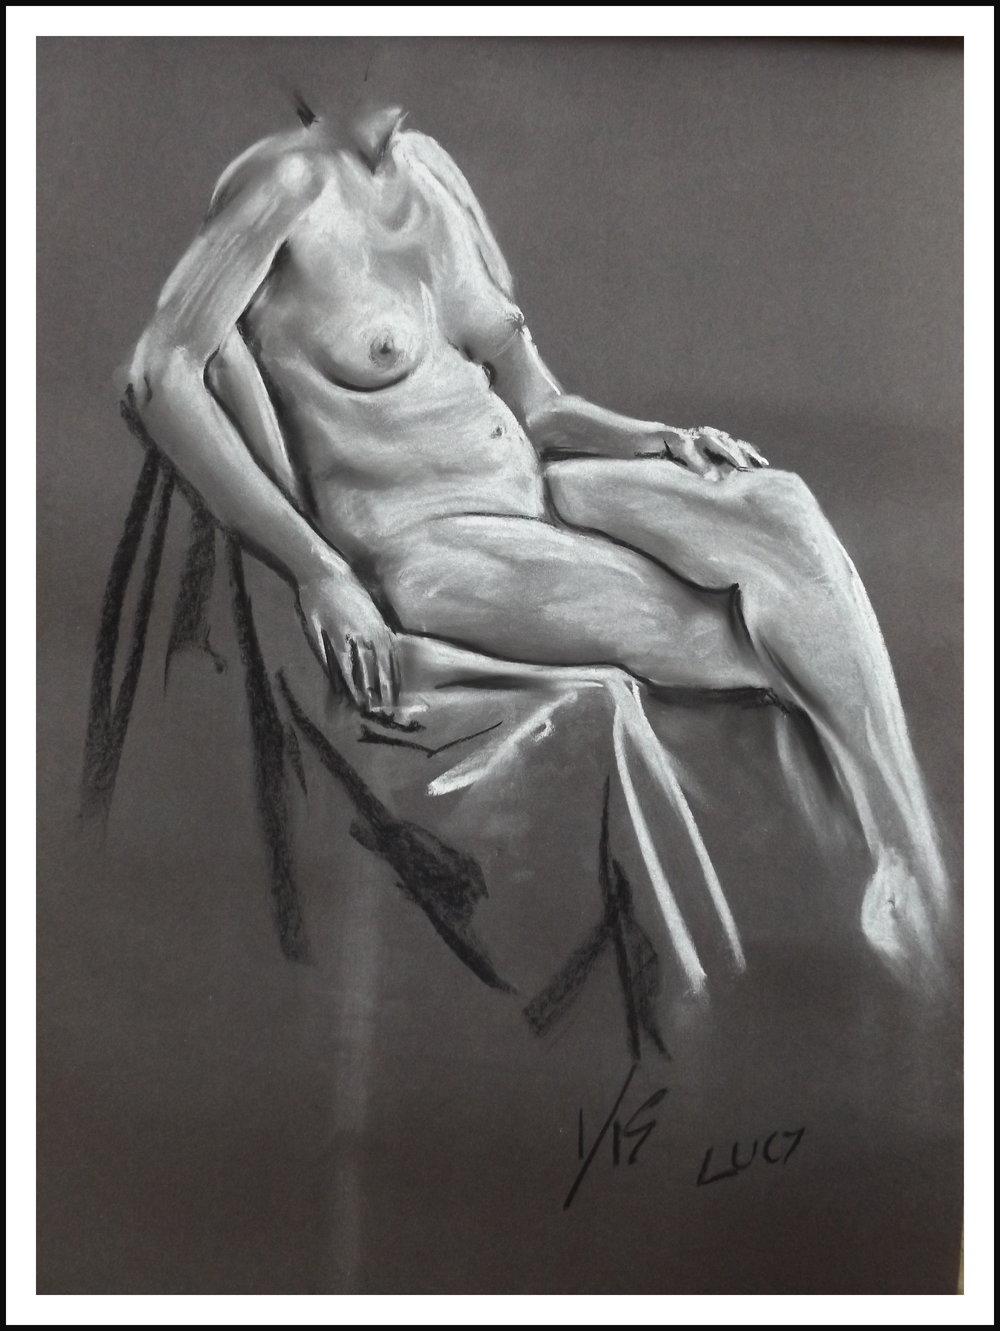 Lucy M 1 15.jpg